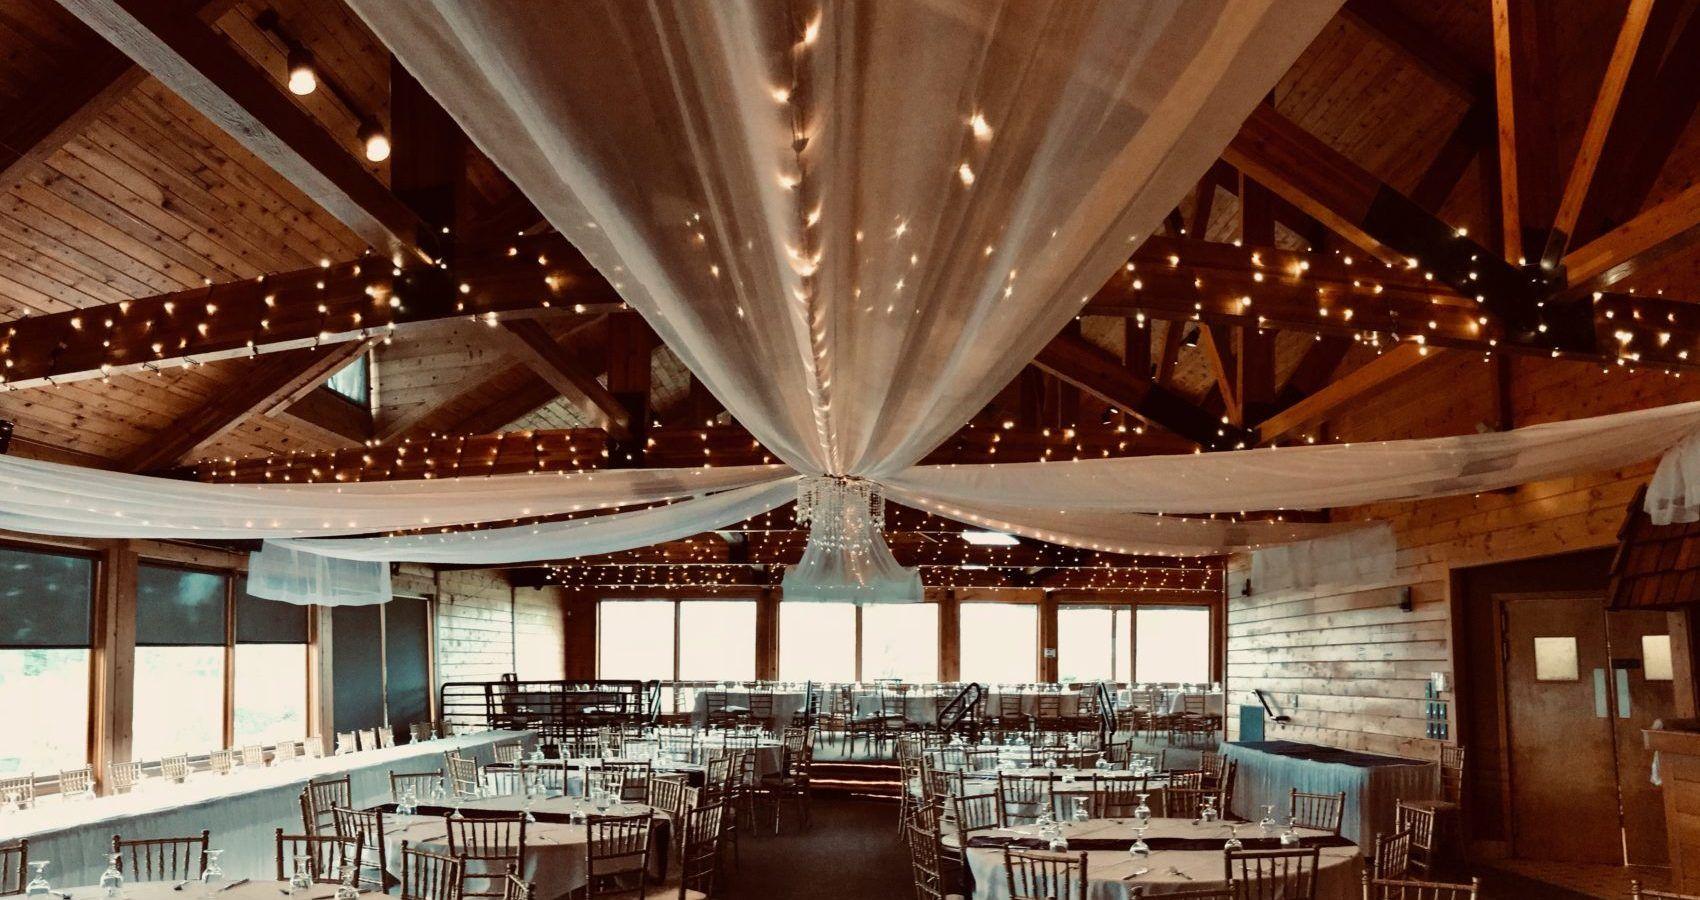 Barn weding venues near me the Myth banquet hall oakland